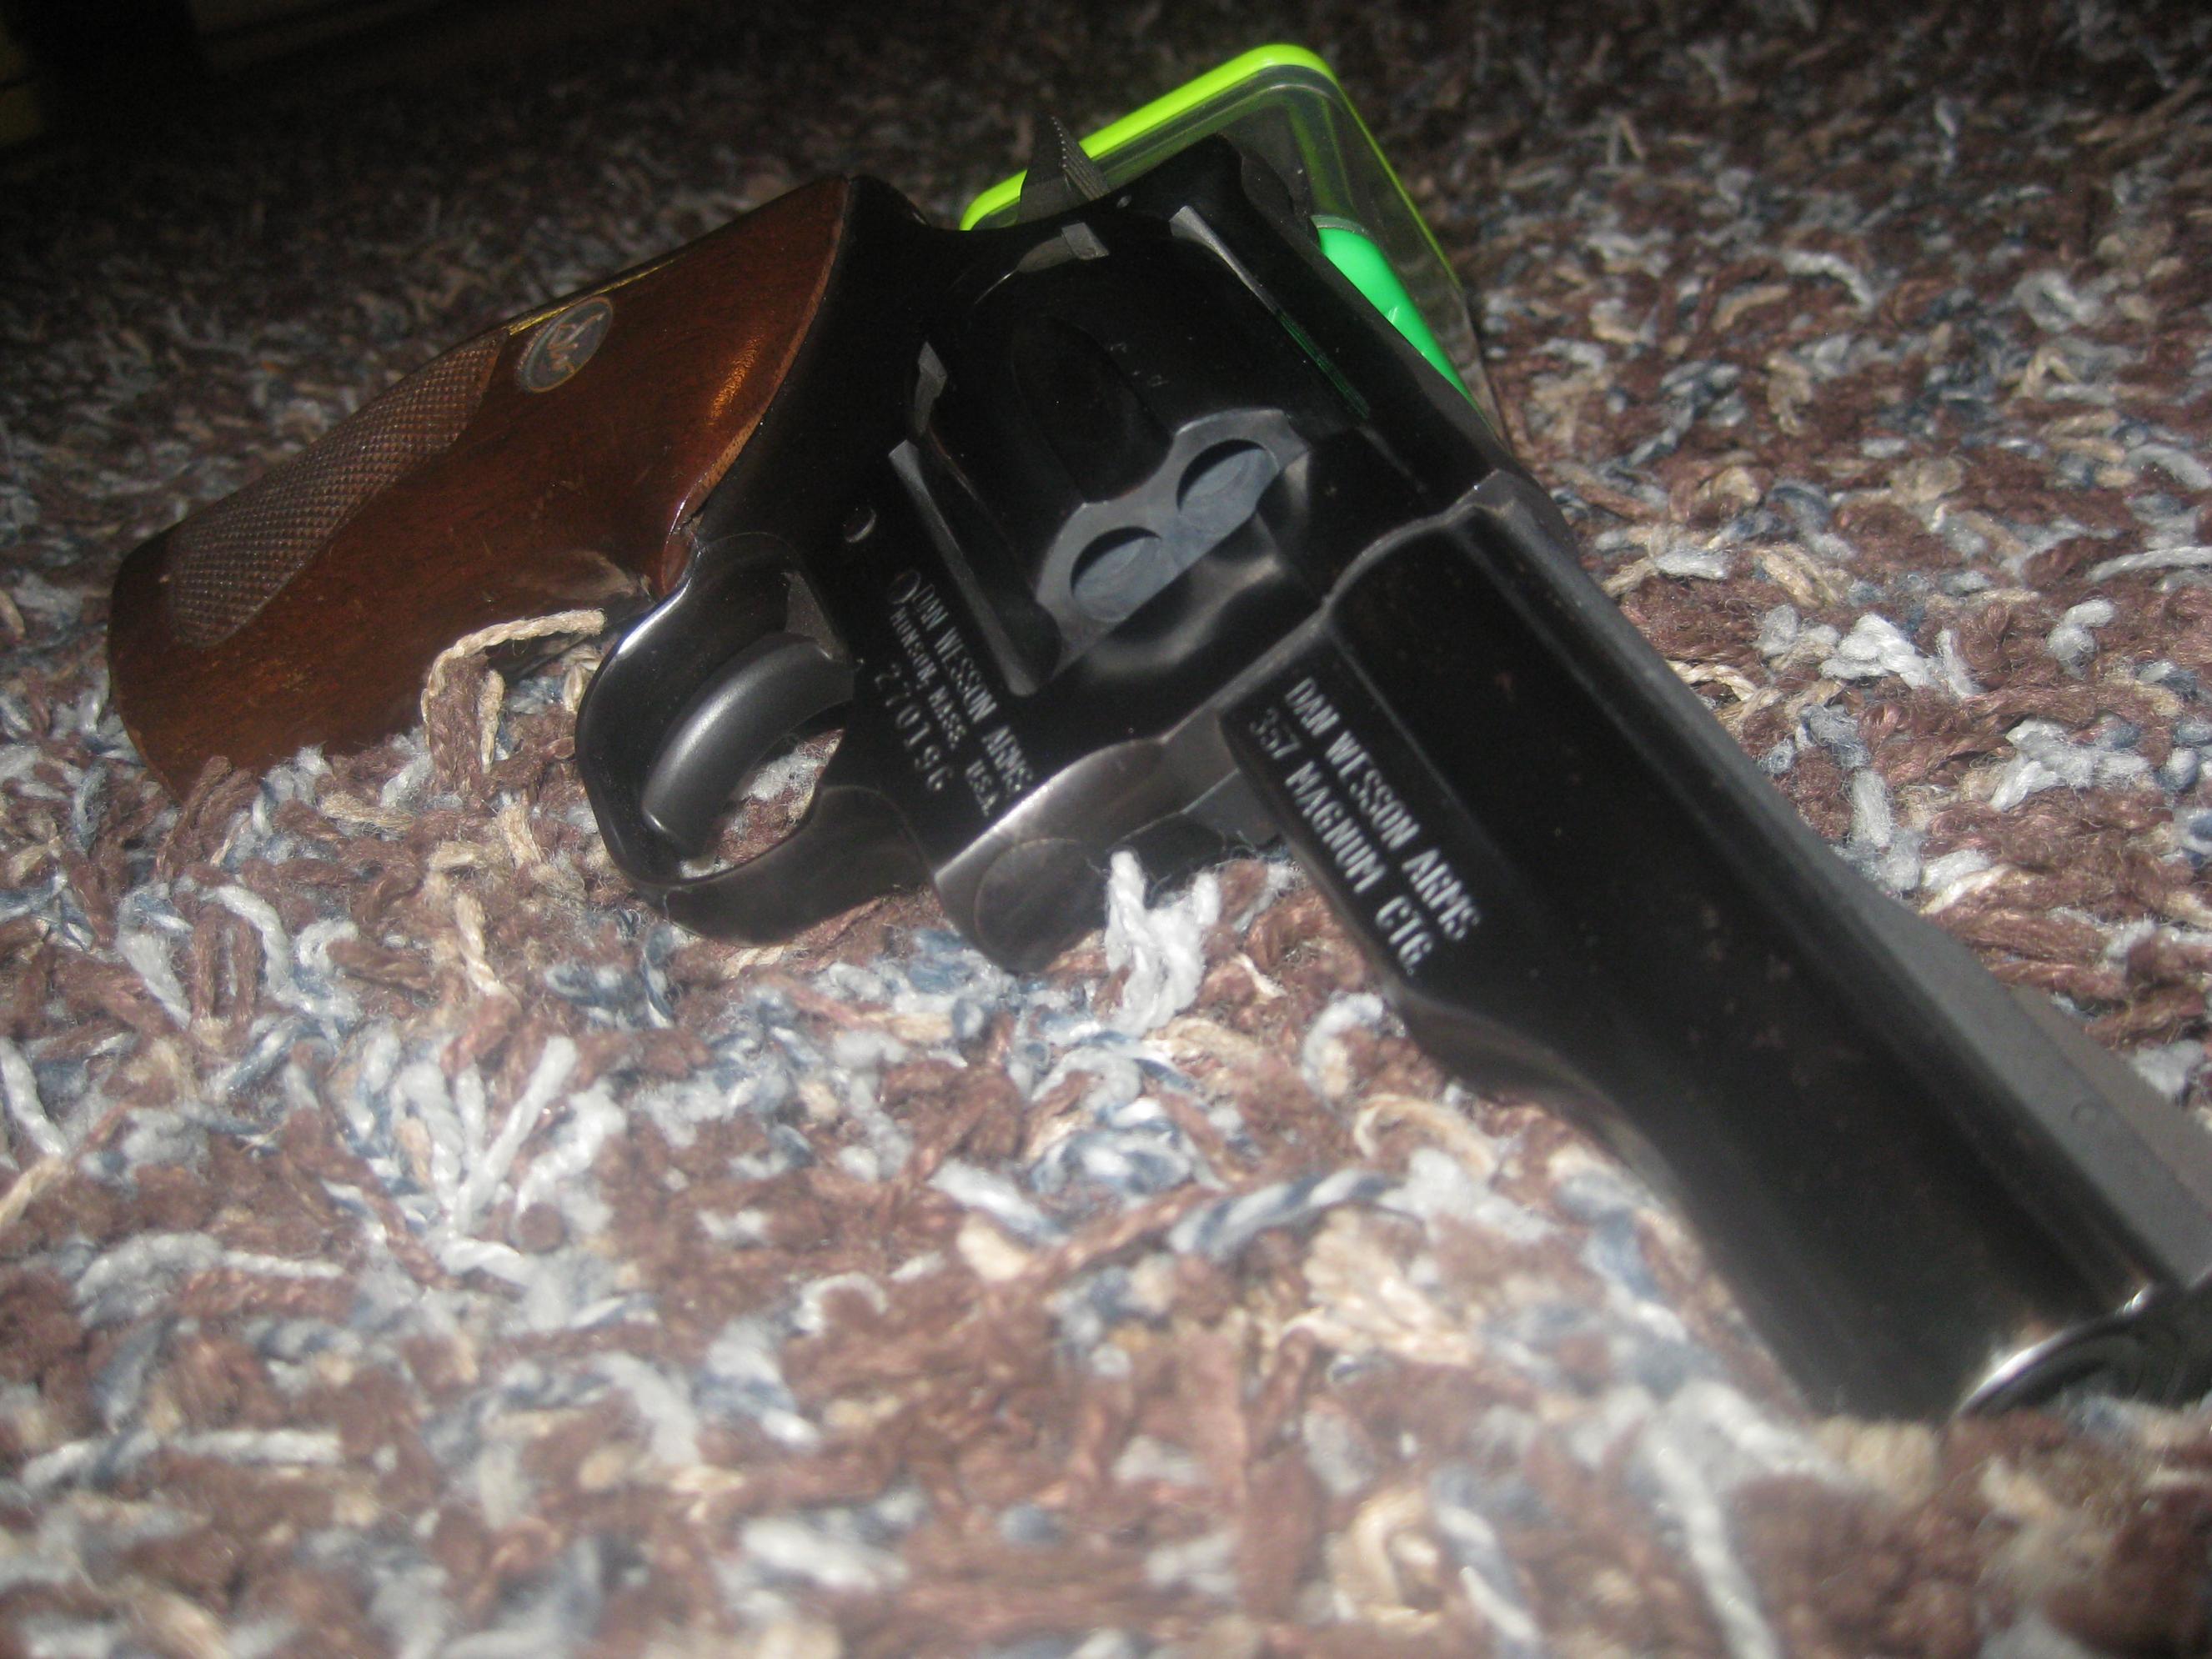 No hi capacity for me! New toys-dw-357-3.jpg